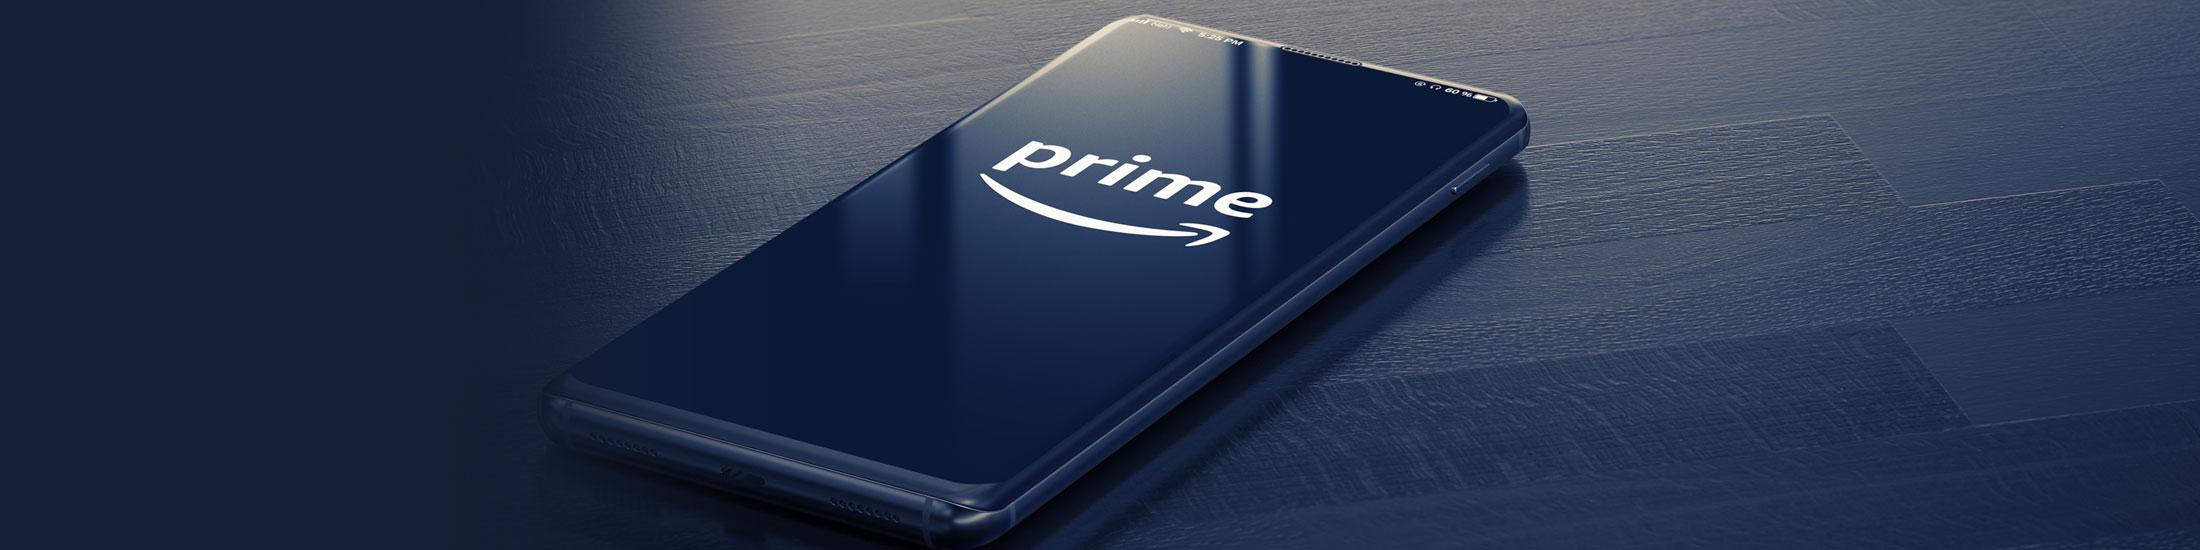 Amazon Prime Day Totals Estimated to Top $9.7 Billion